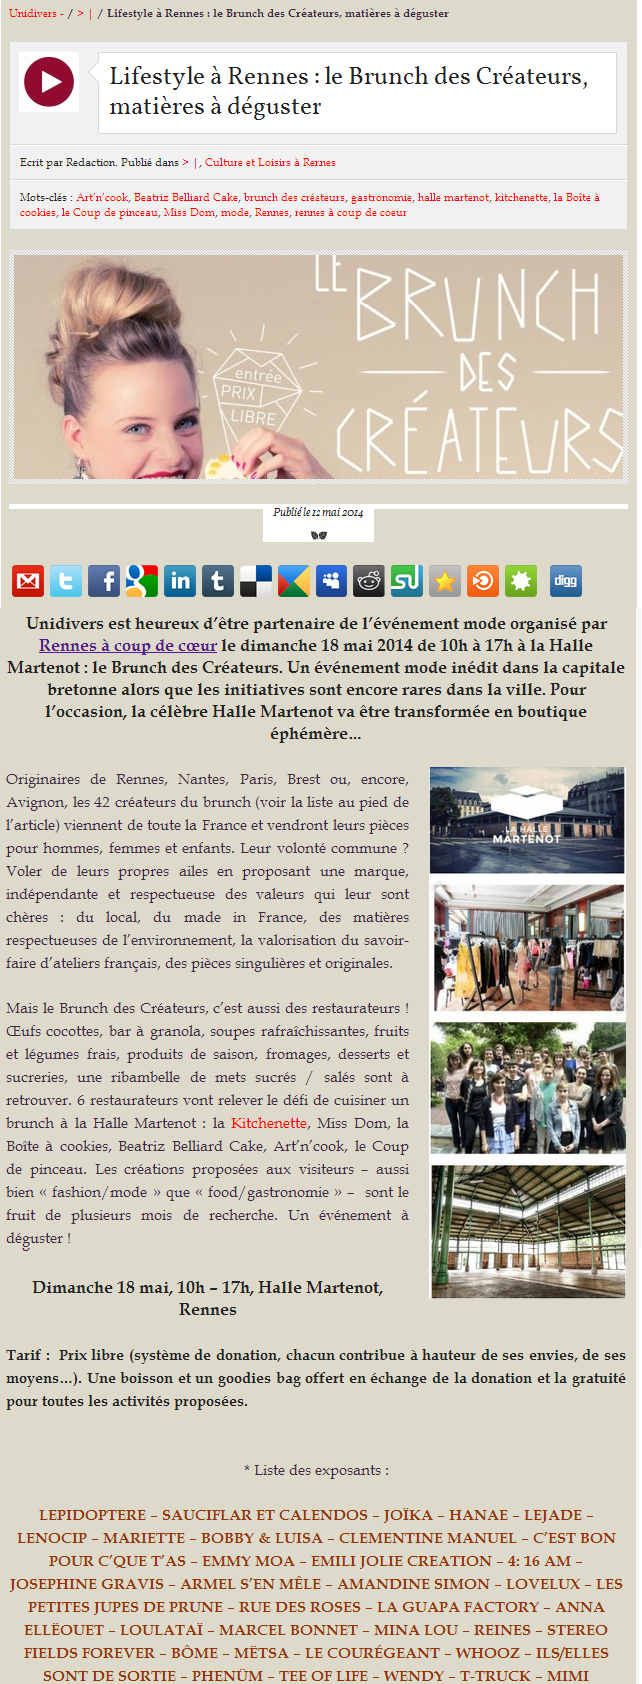 Unidivers.fr - mai 2014